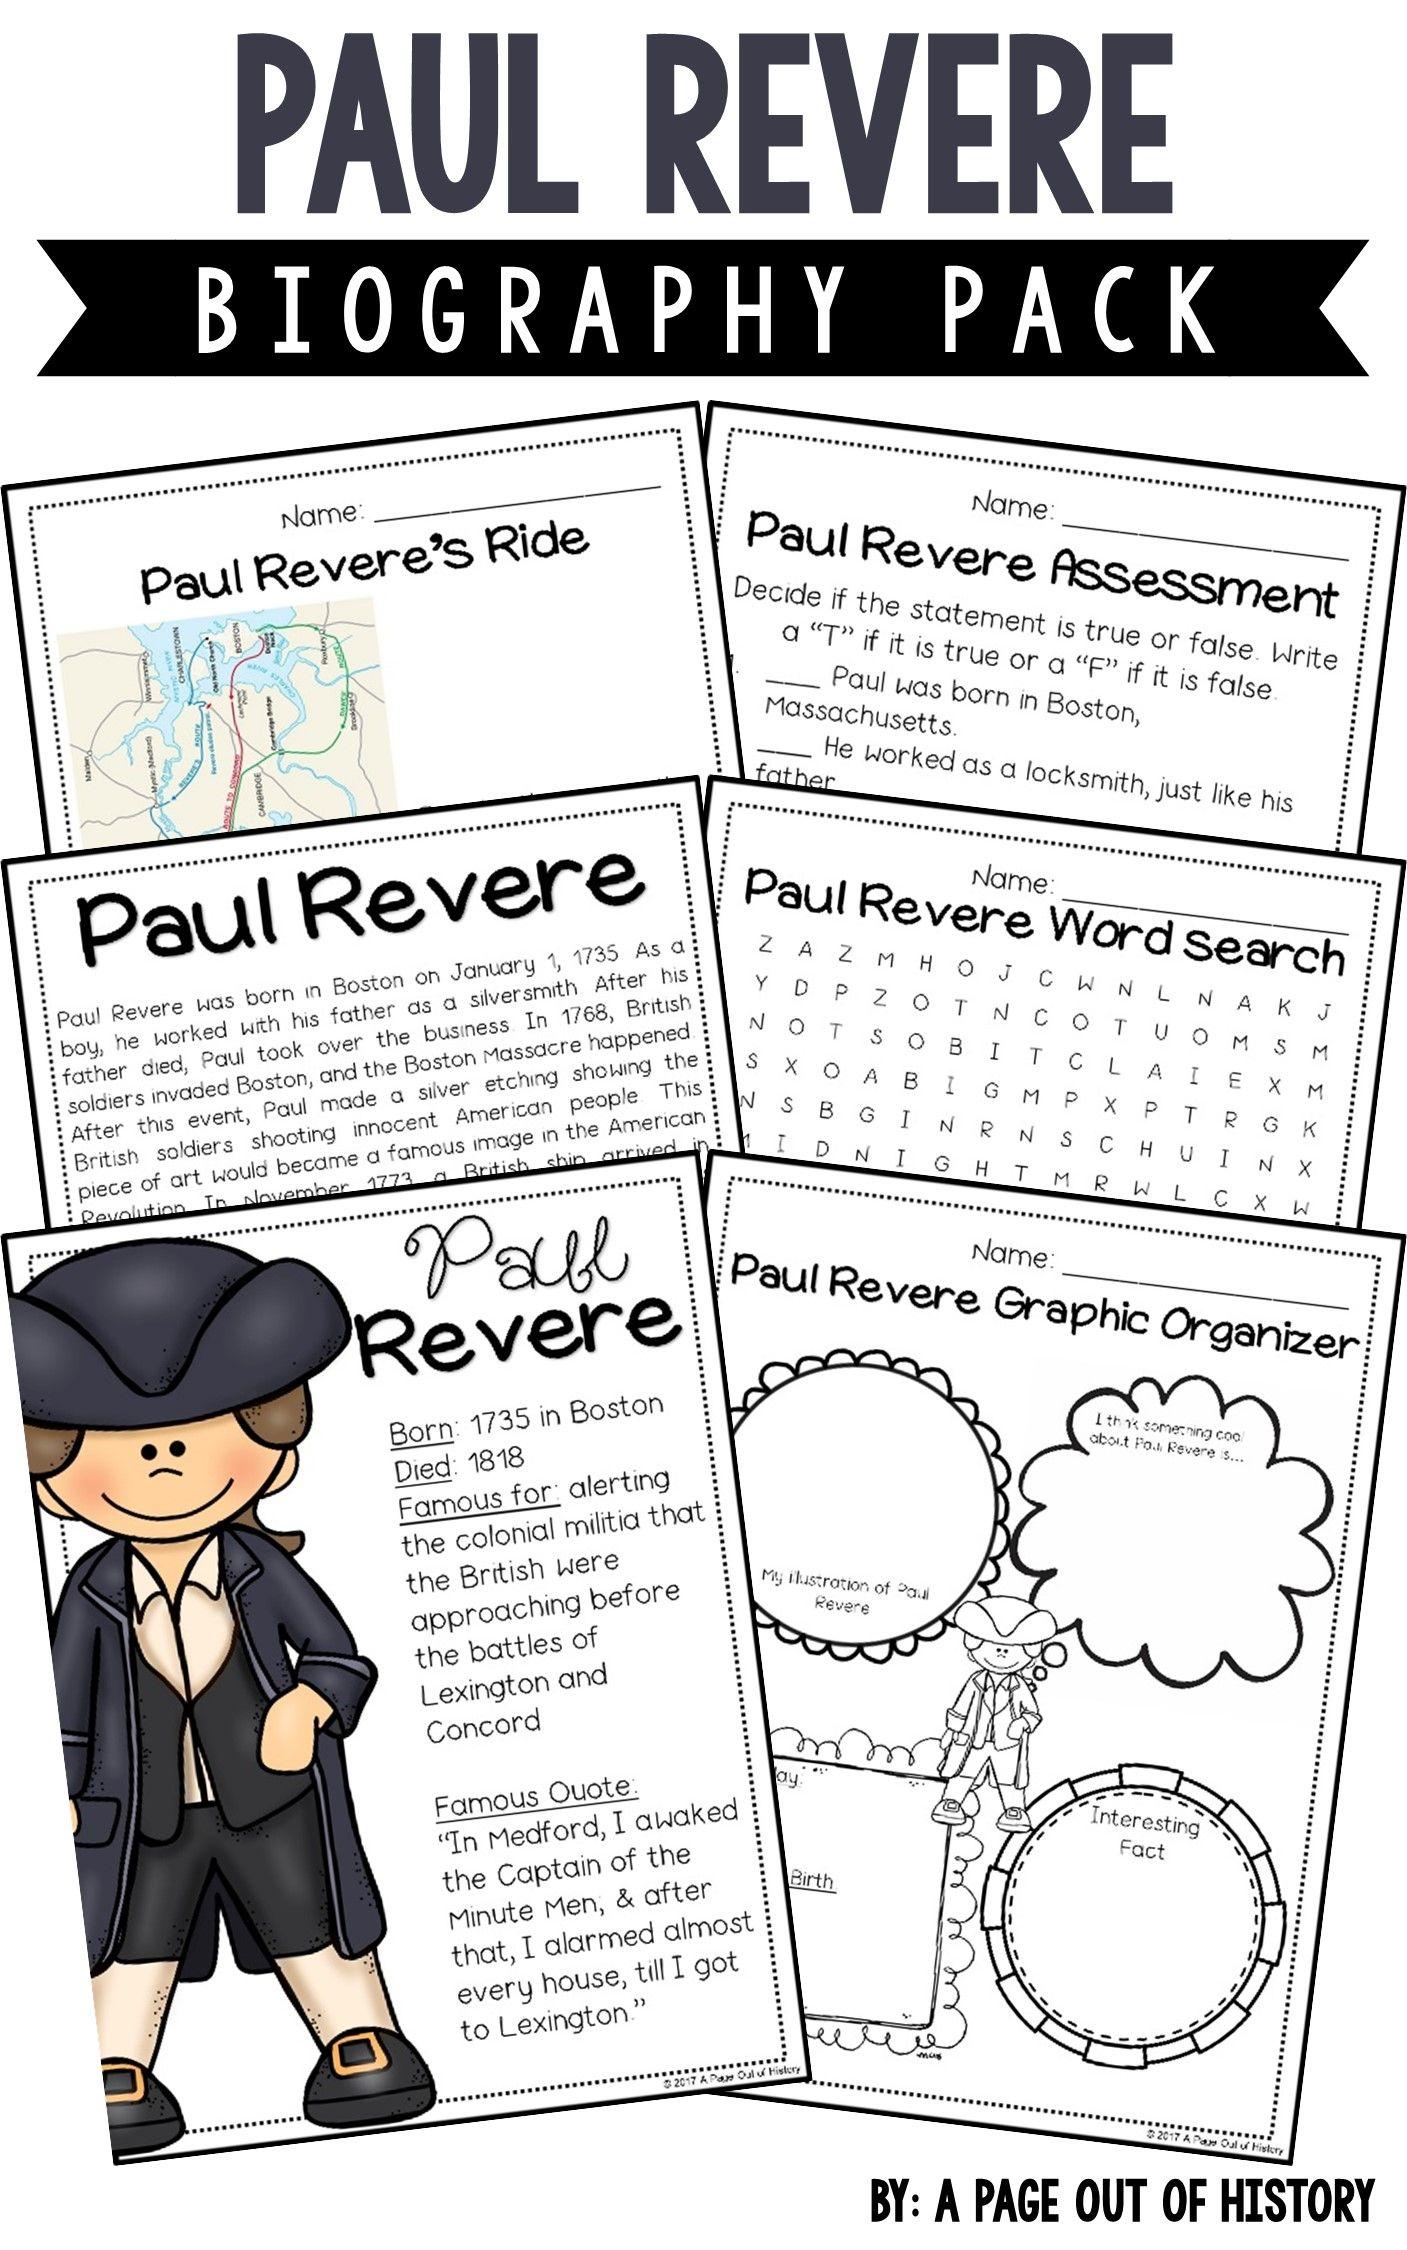 Paul Revere Biography Pack